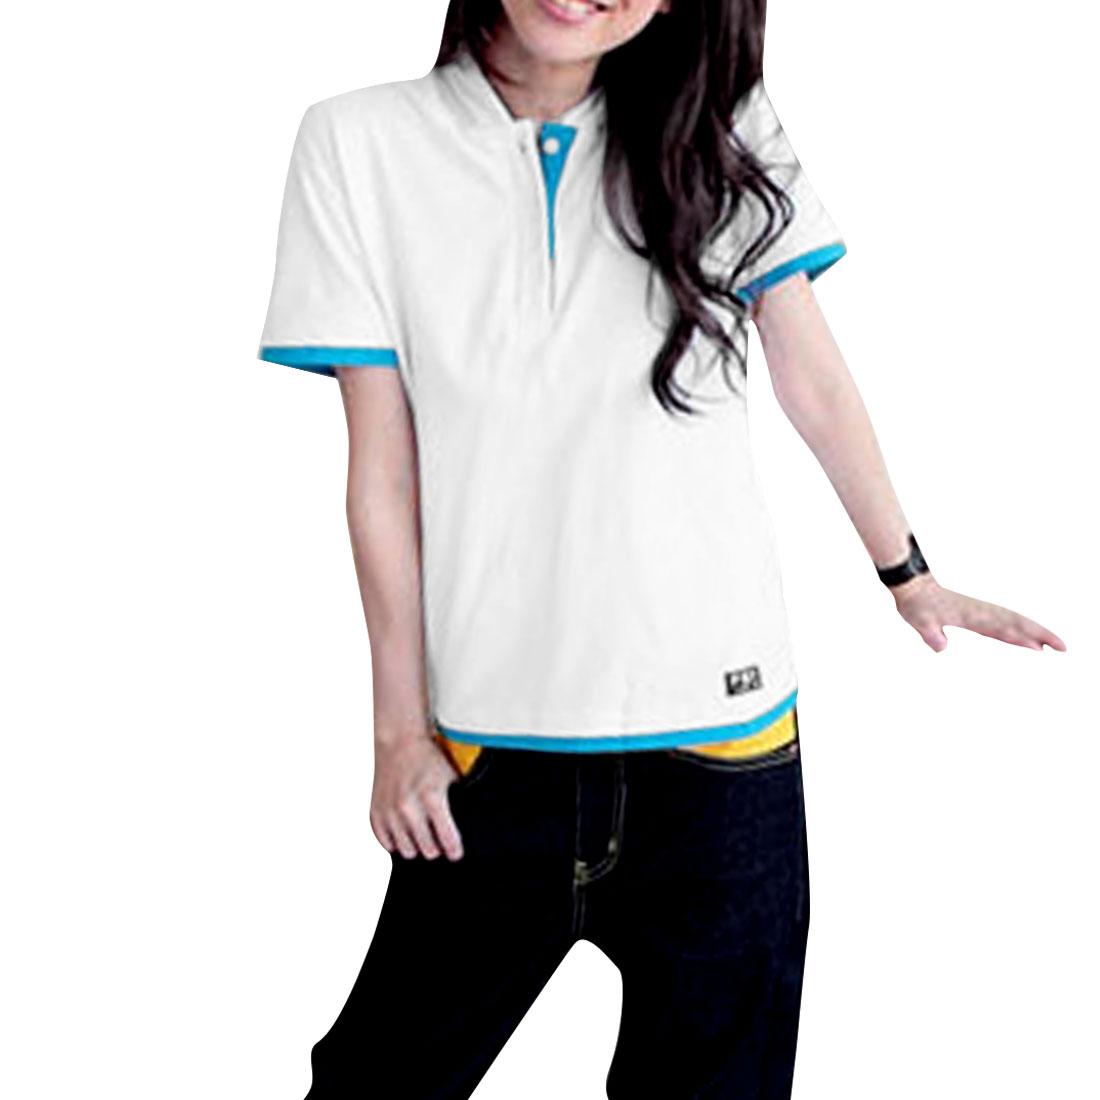 Ladies Short Sleeves Hoodie Shirt White Light Blue L